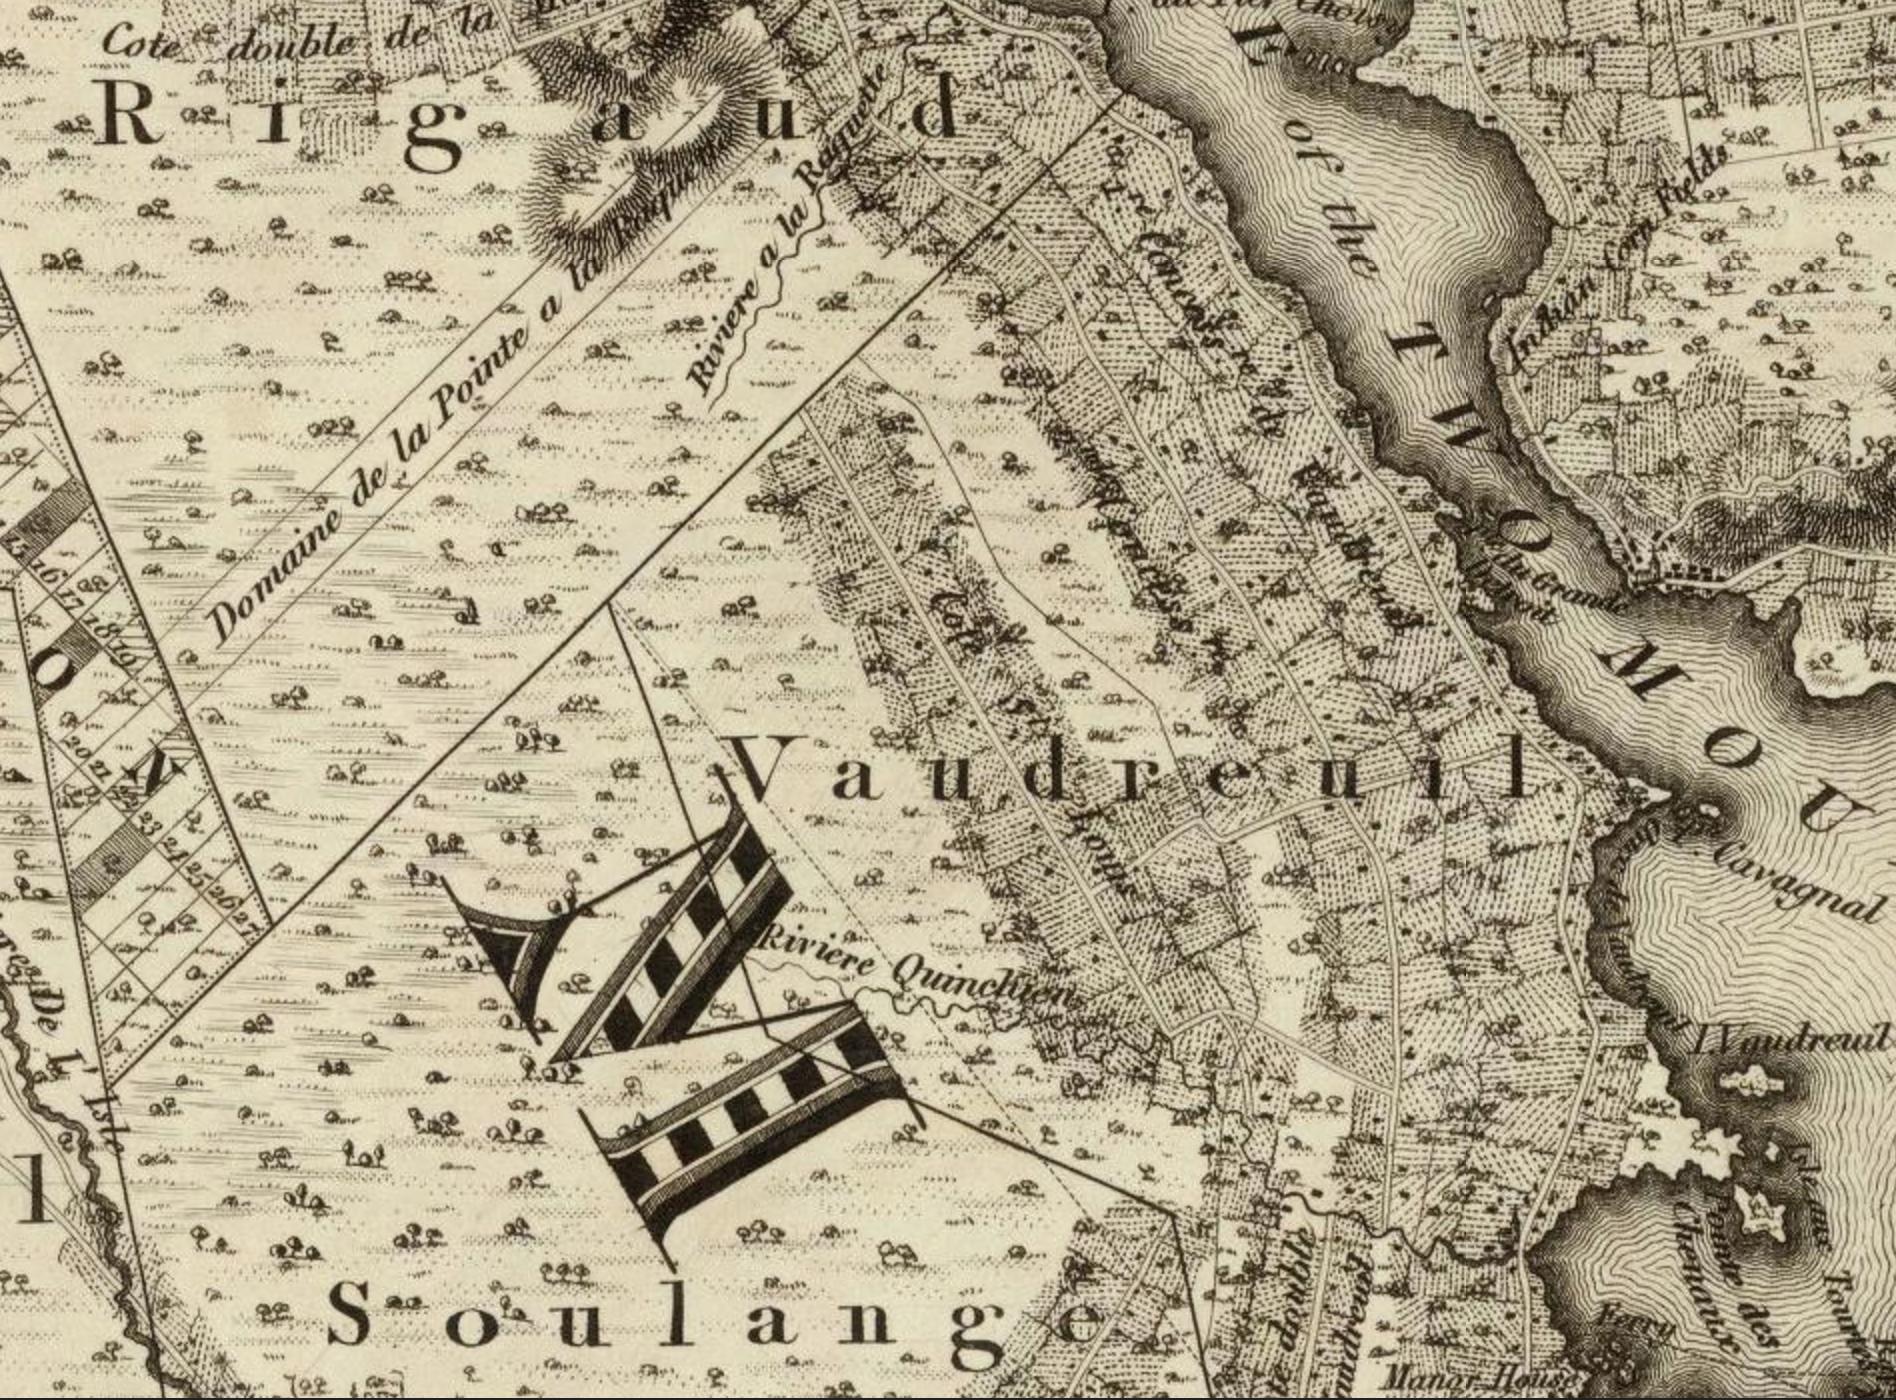 1815_Bouchette1.png